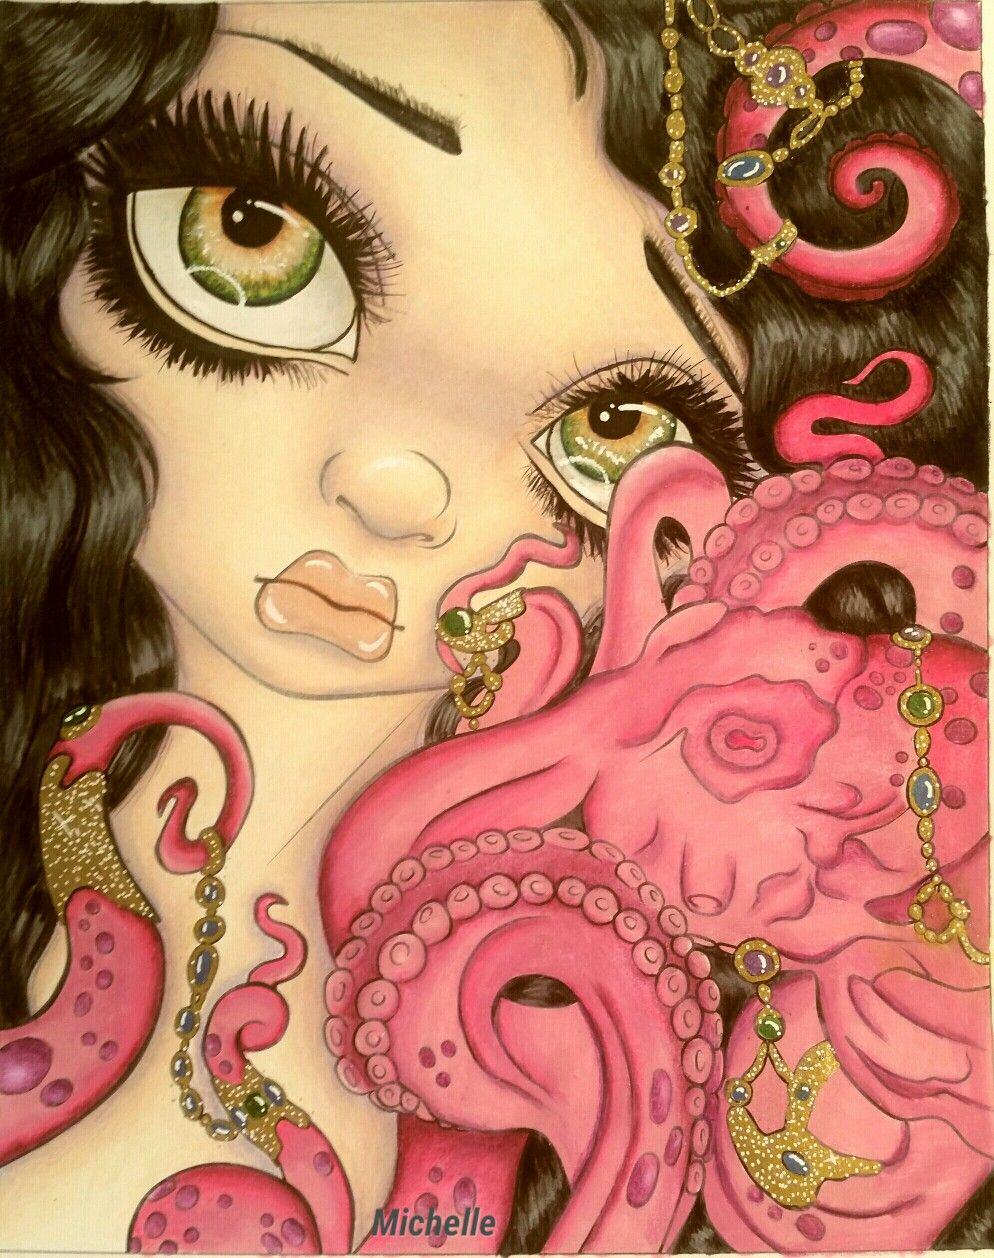 Jasmine Beckett Griffith | Jasmine becket griffith, Mermaid books, Becket